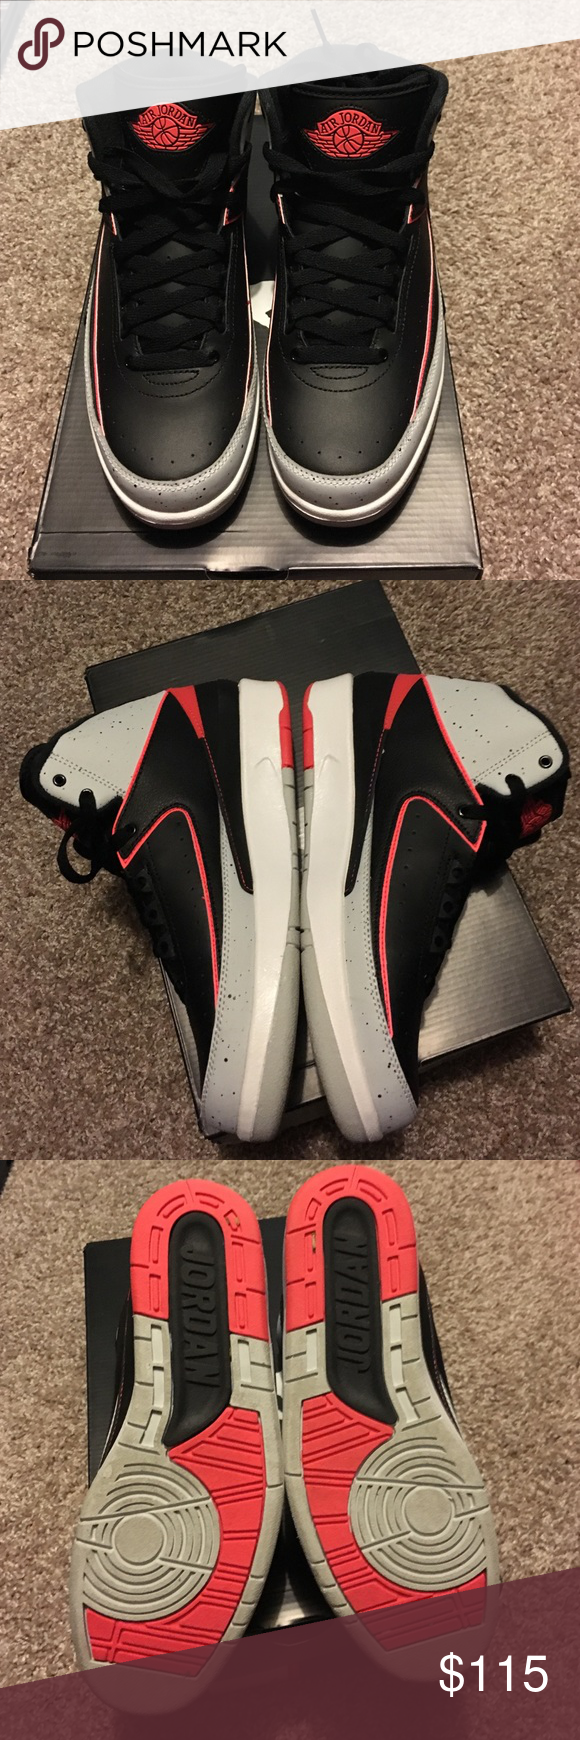 5cf1ff7360 Air Jordan 2 Retro Worn twice. No scratches. No creases. Original packaging.